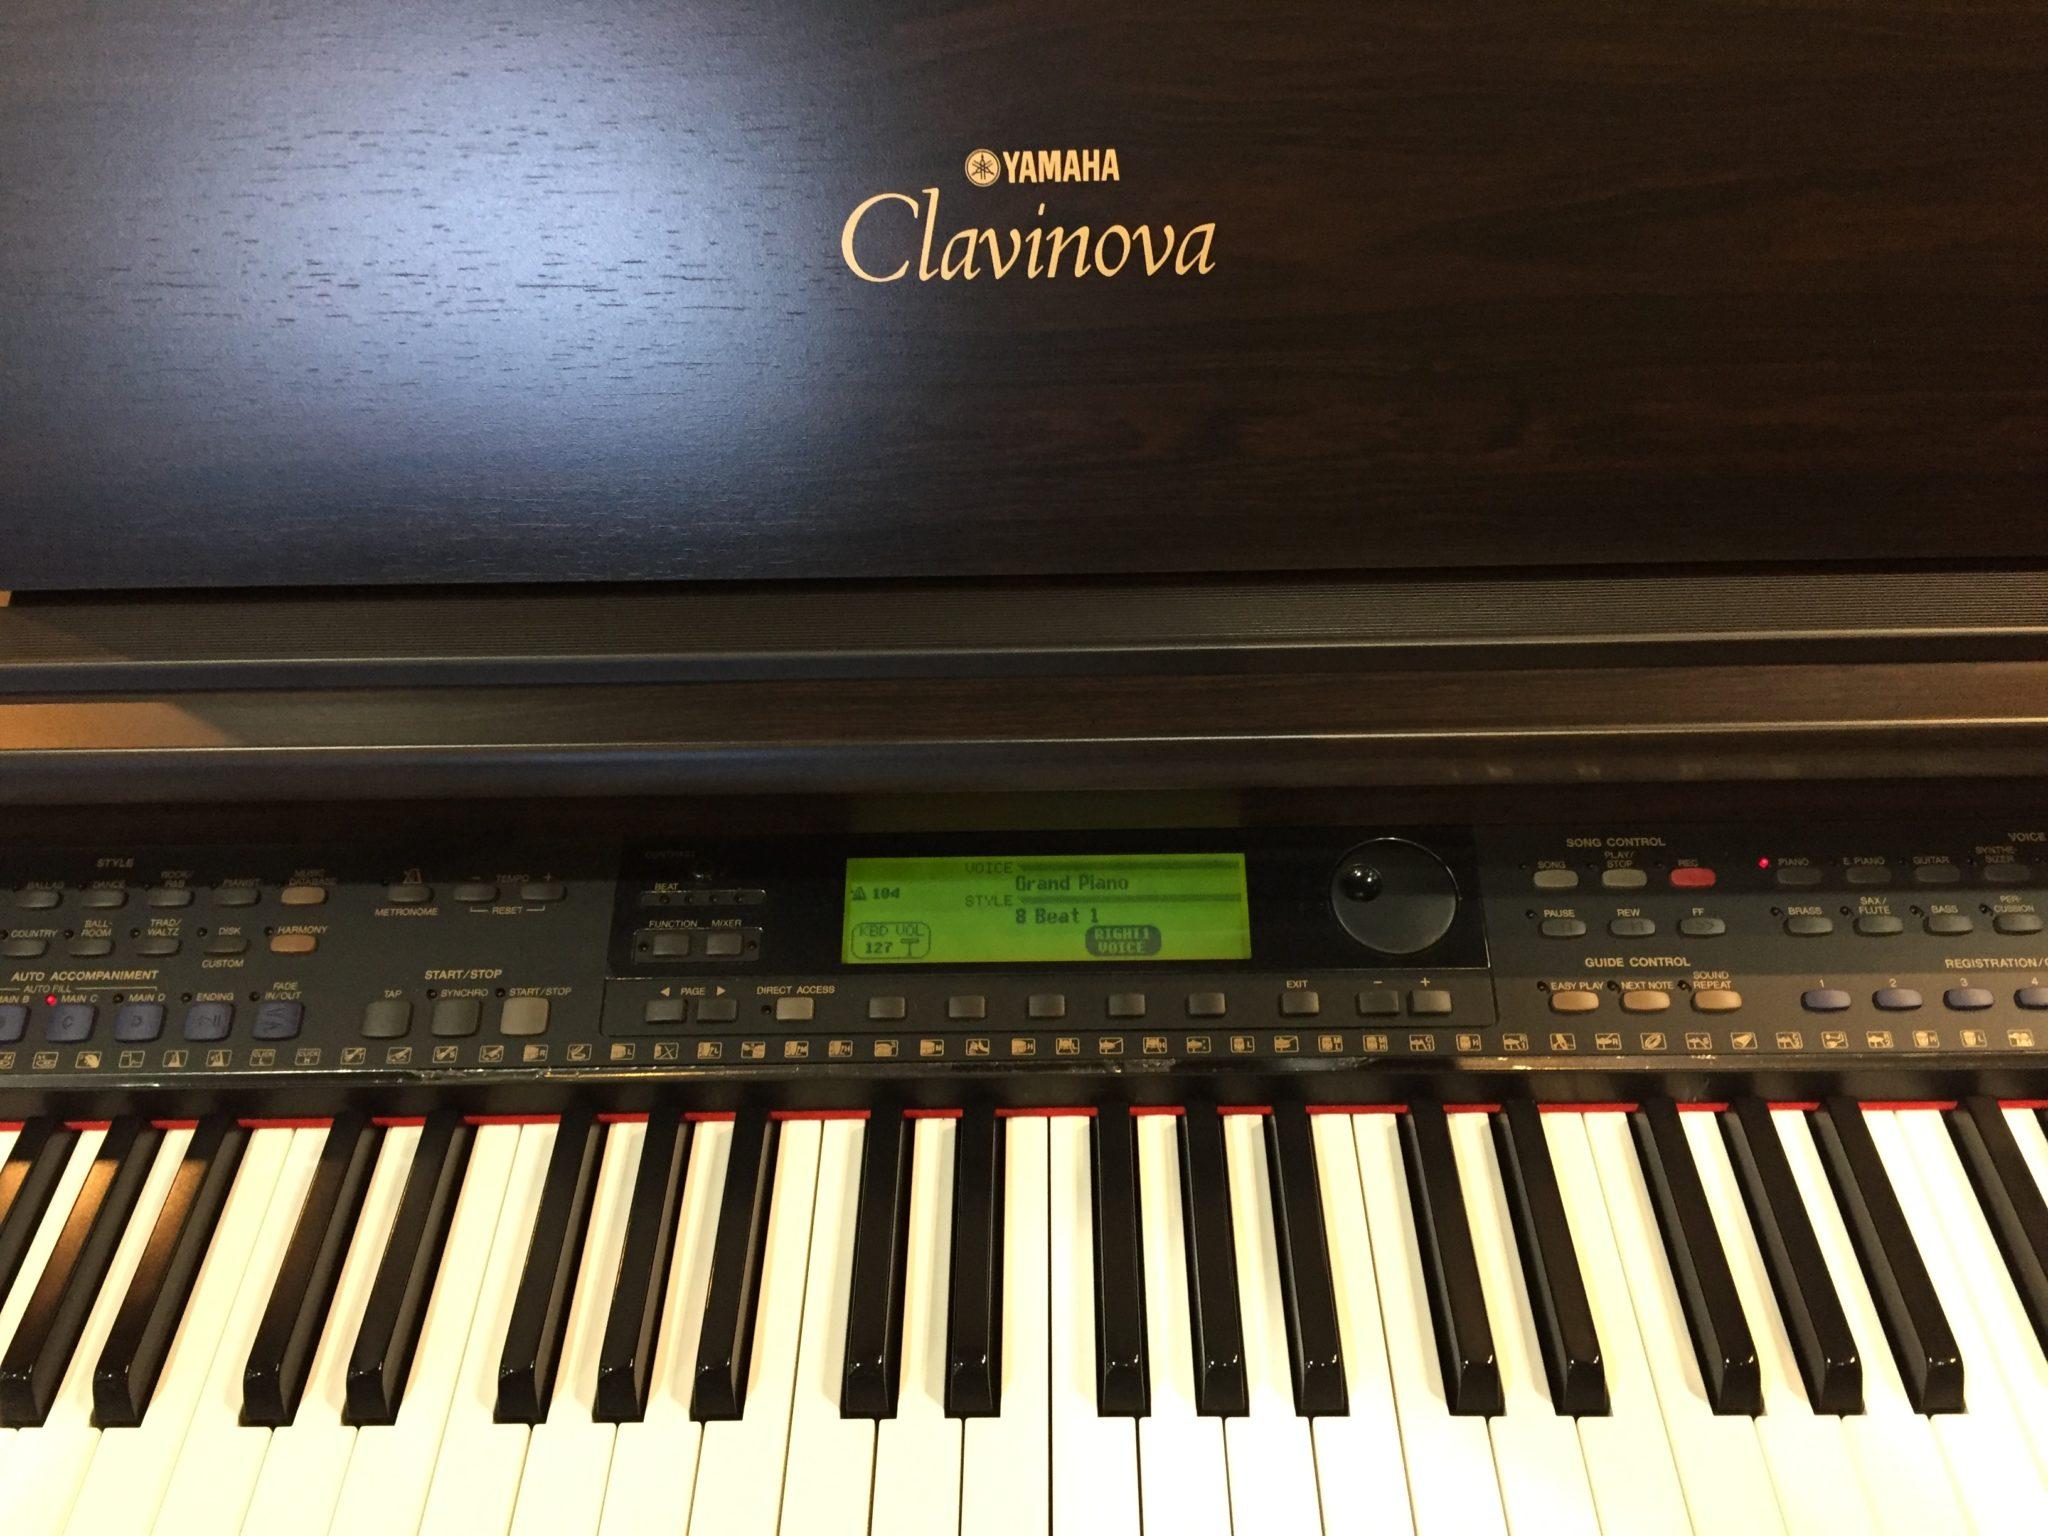 Yamaha Clavinova - Model CVP-103 digital piano (Sold